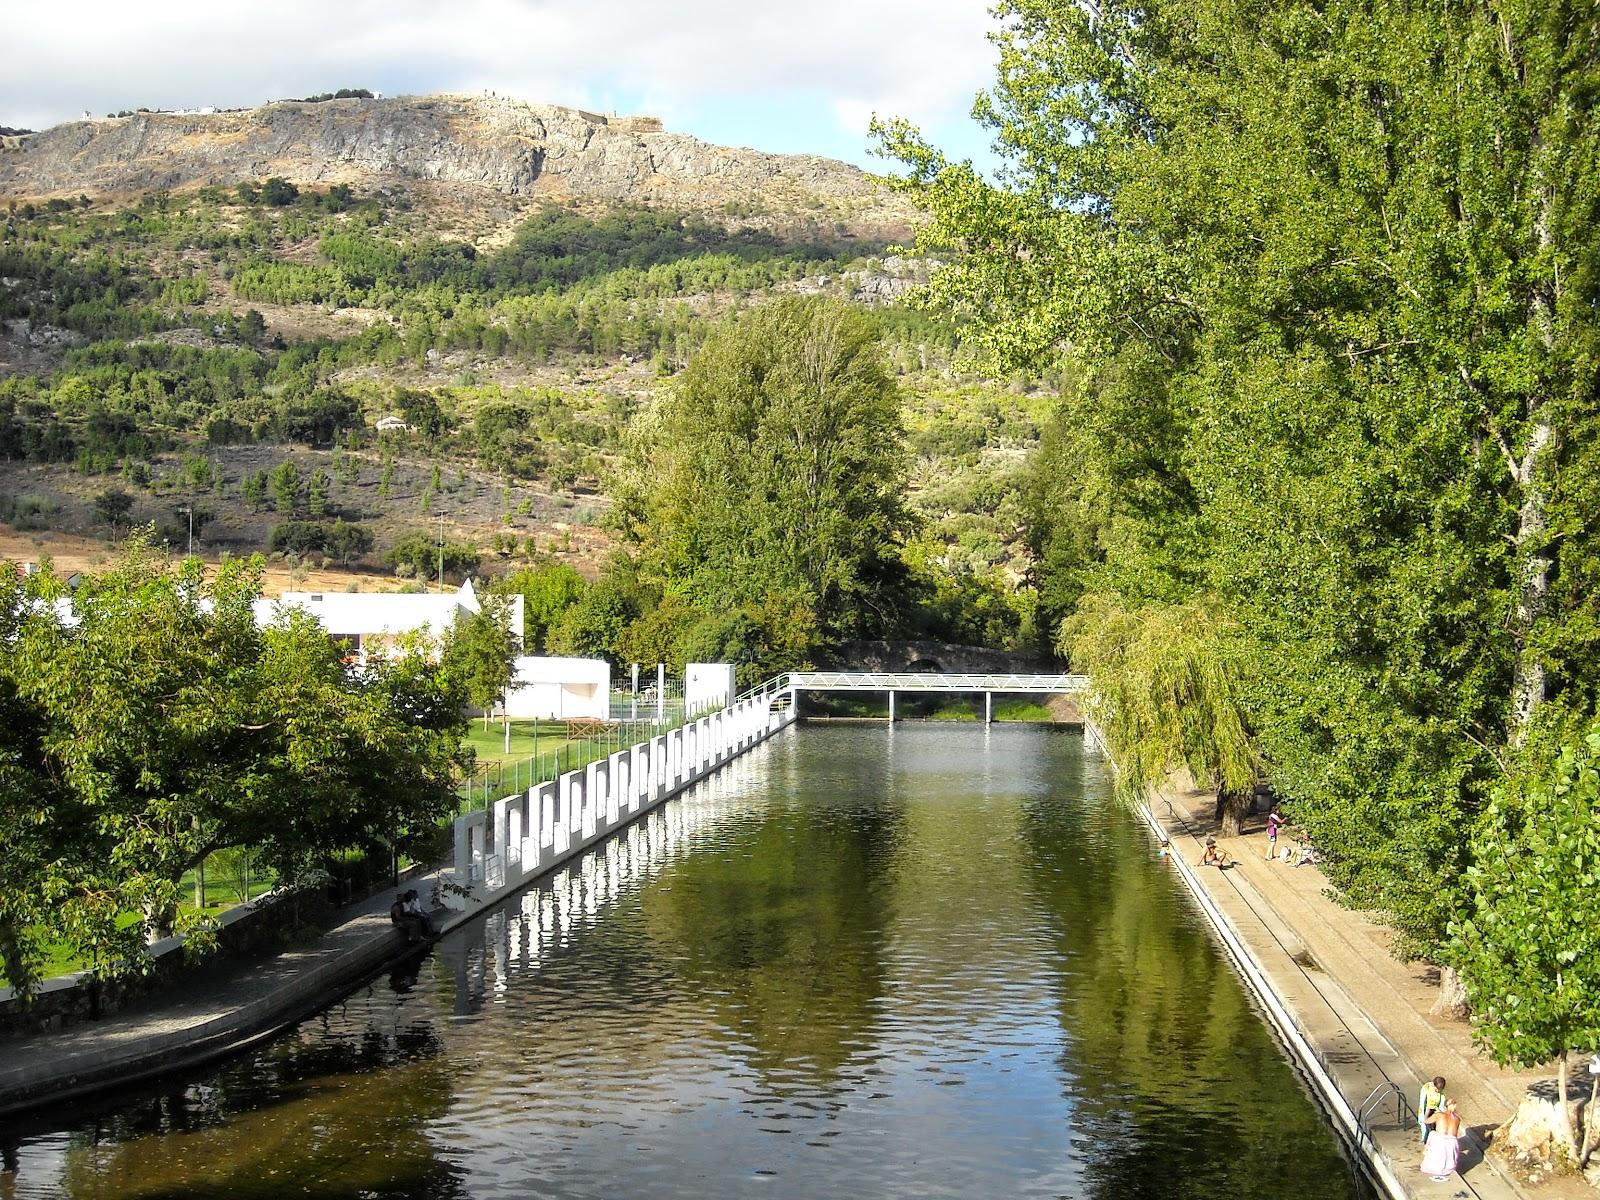 El arte de la naturaleza piscinas naturales for Portugal piscinas naturales